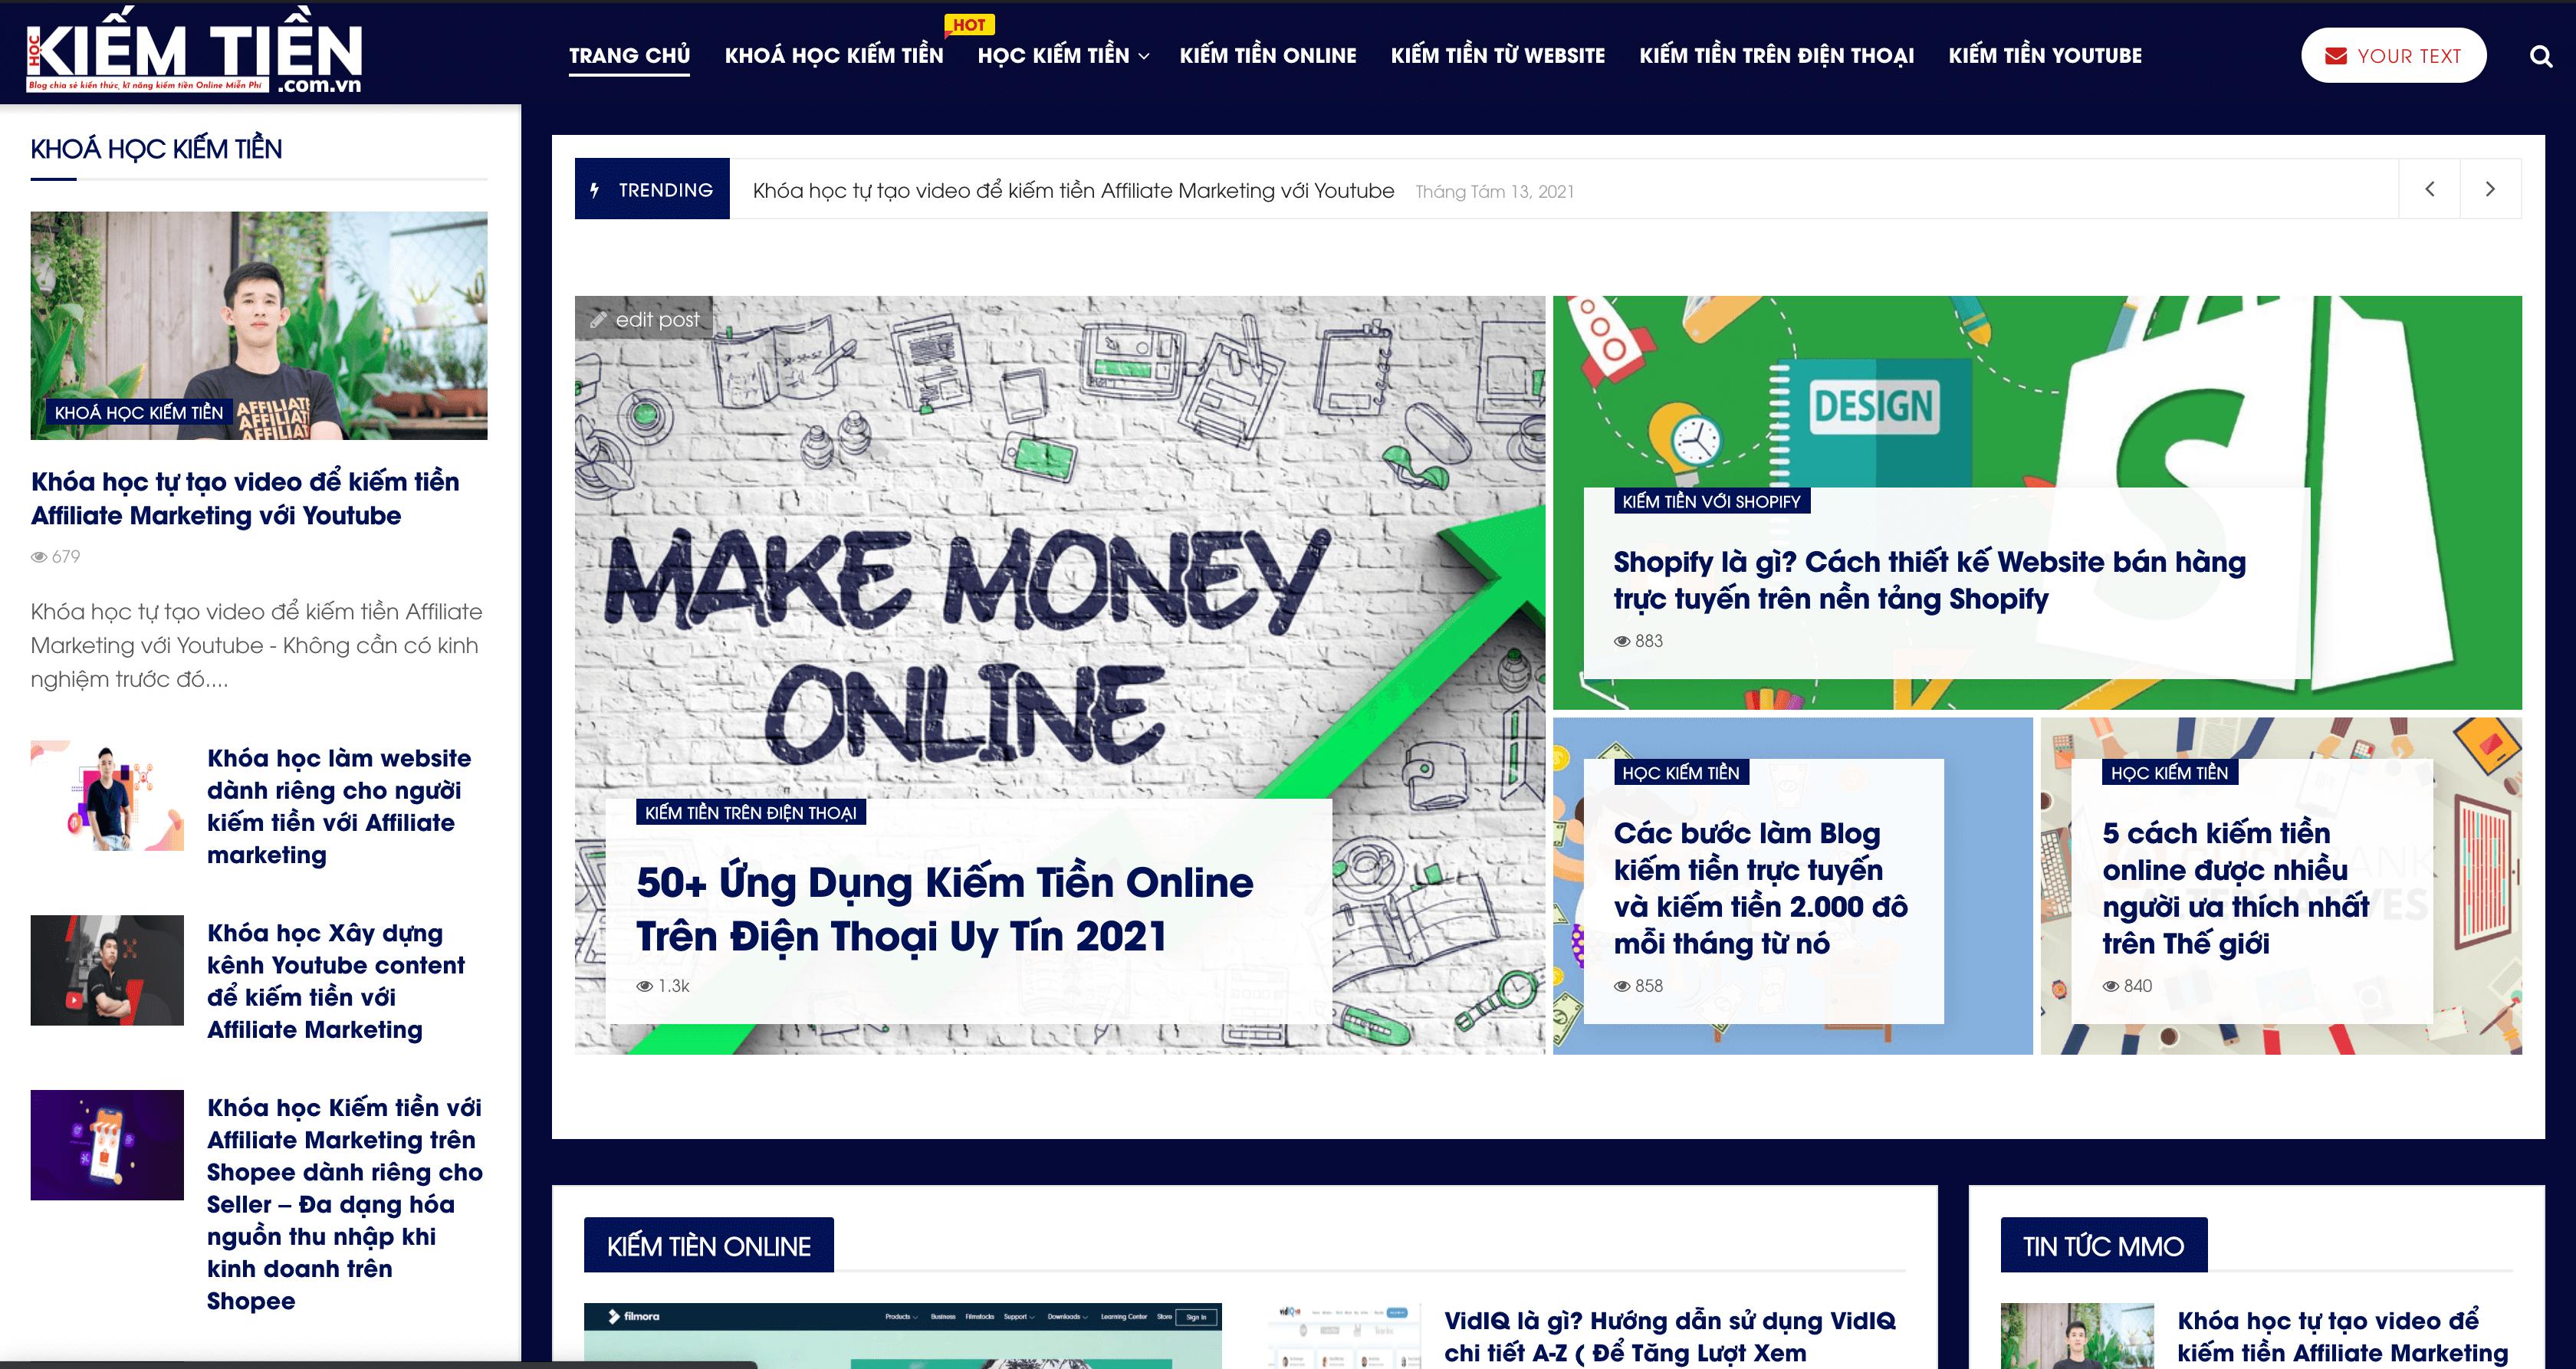 Hockiemtien.com.vn